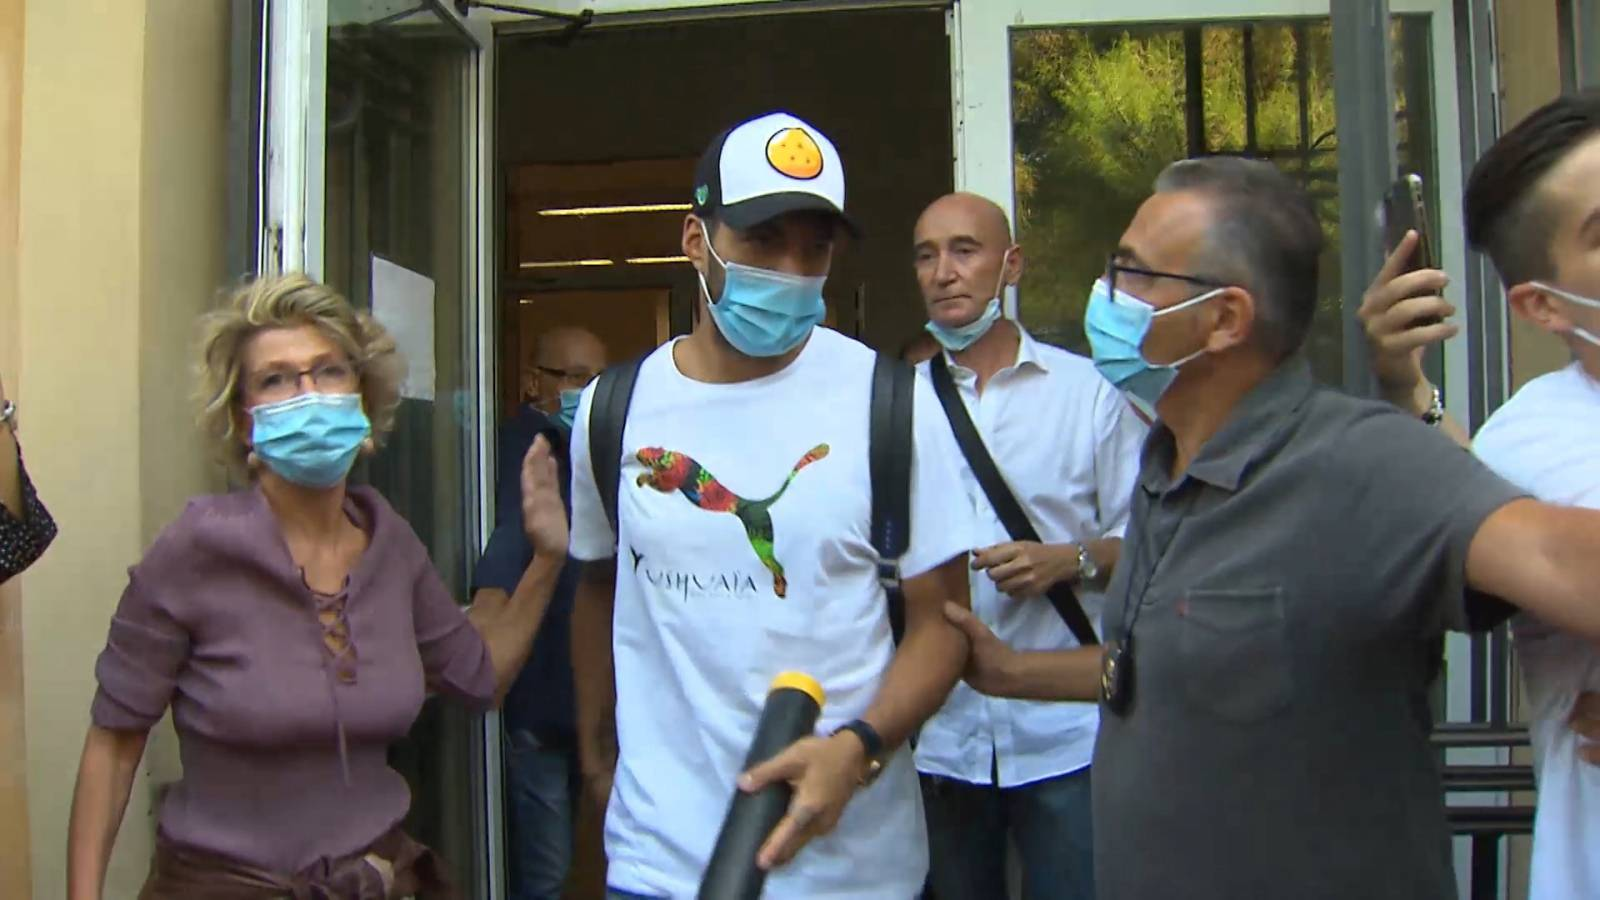 Soccer-Suarez language exam for Italian citizenship was rigged, say prosecutors